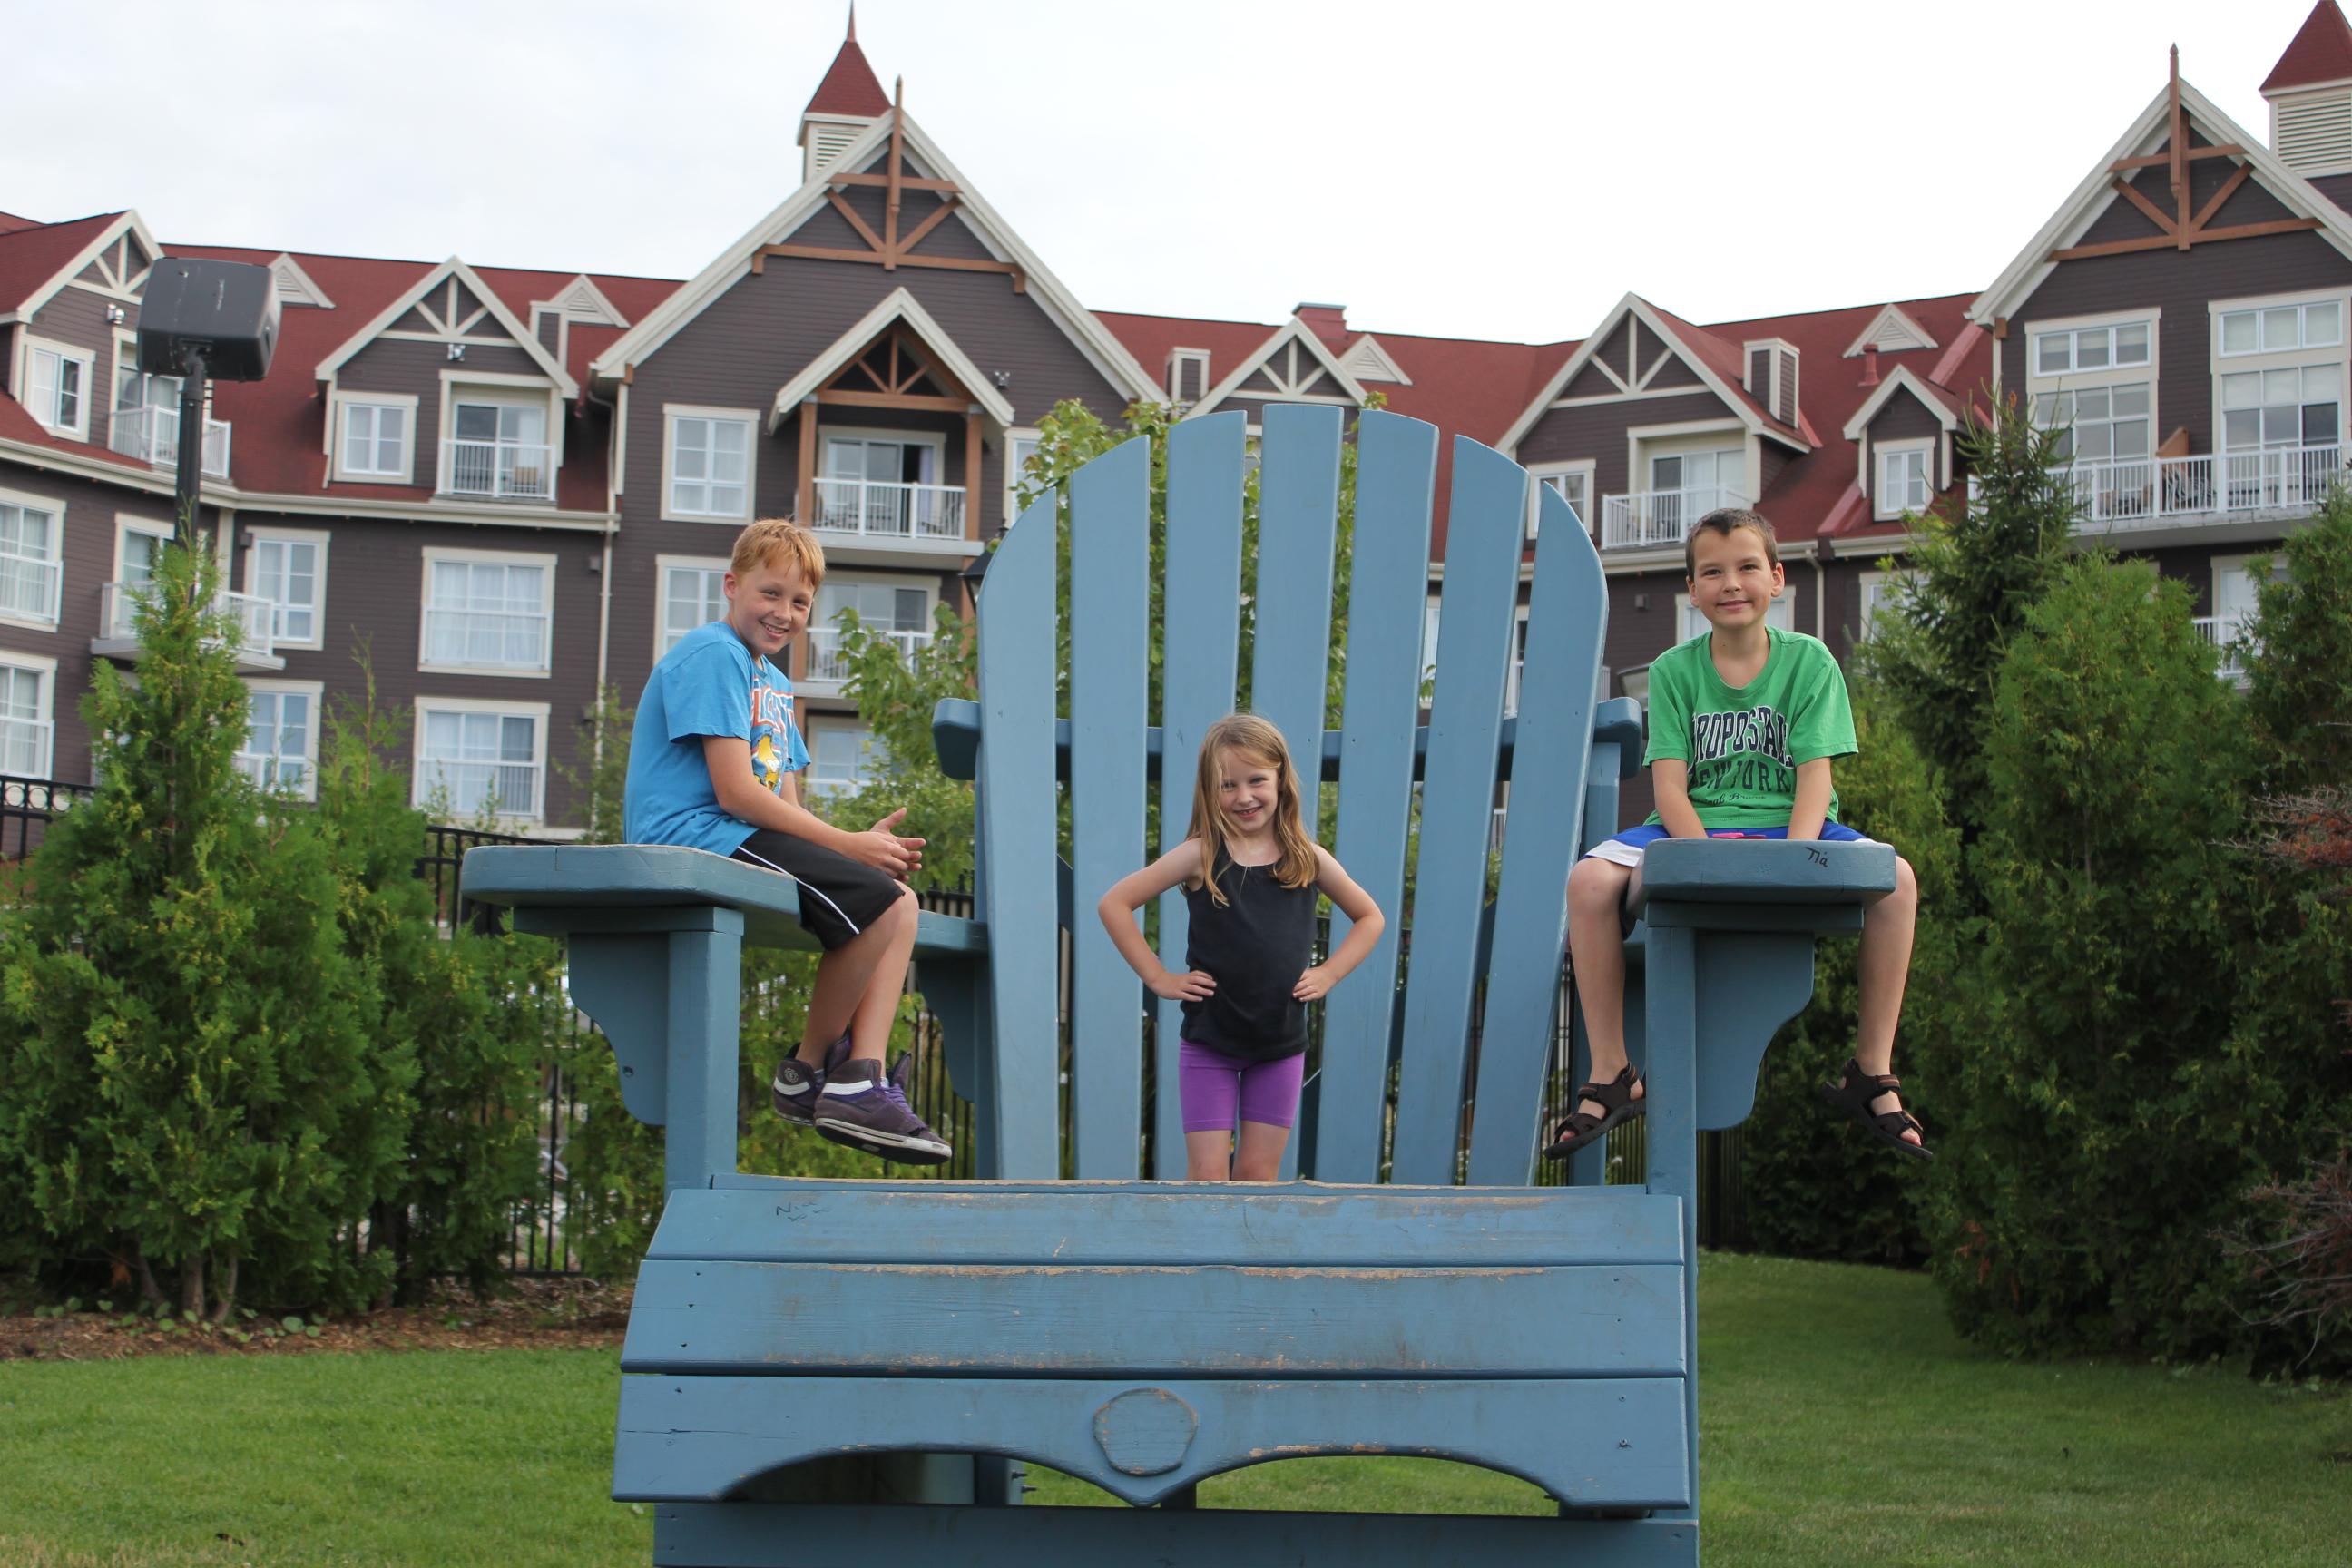 Summer Family Fun at Blue Mountain